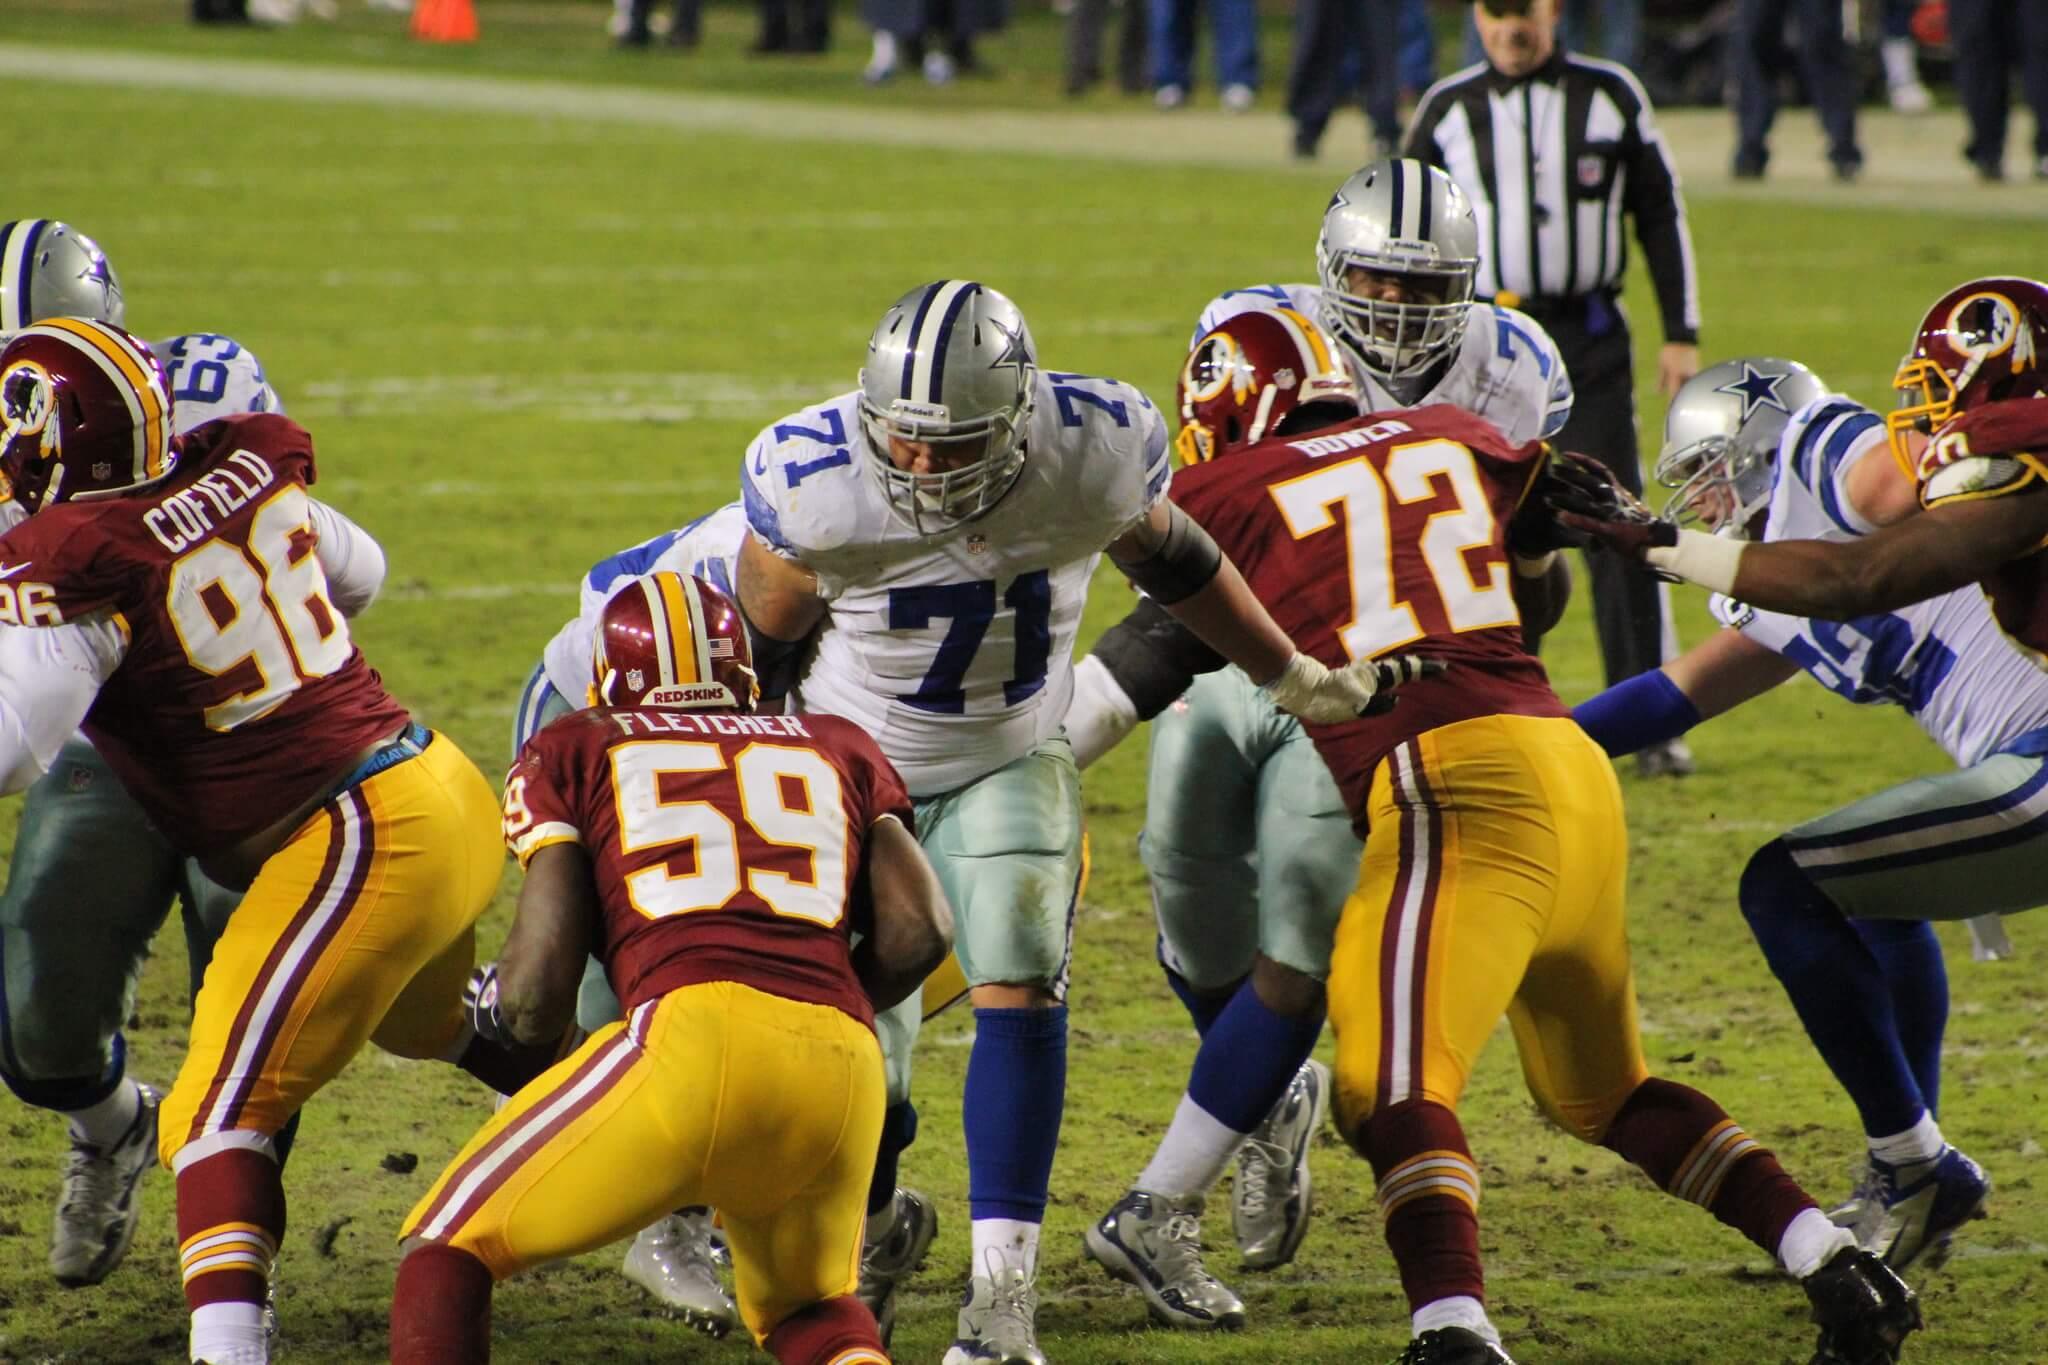 Dallas Cowboys vs Washington Redskins NFL football rivalry